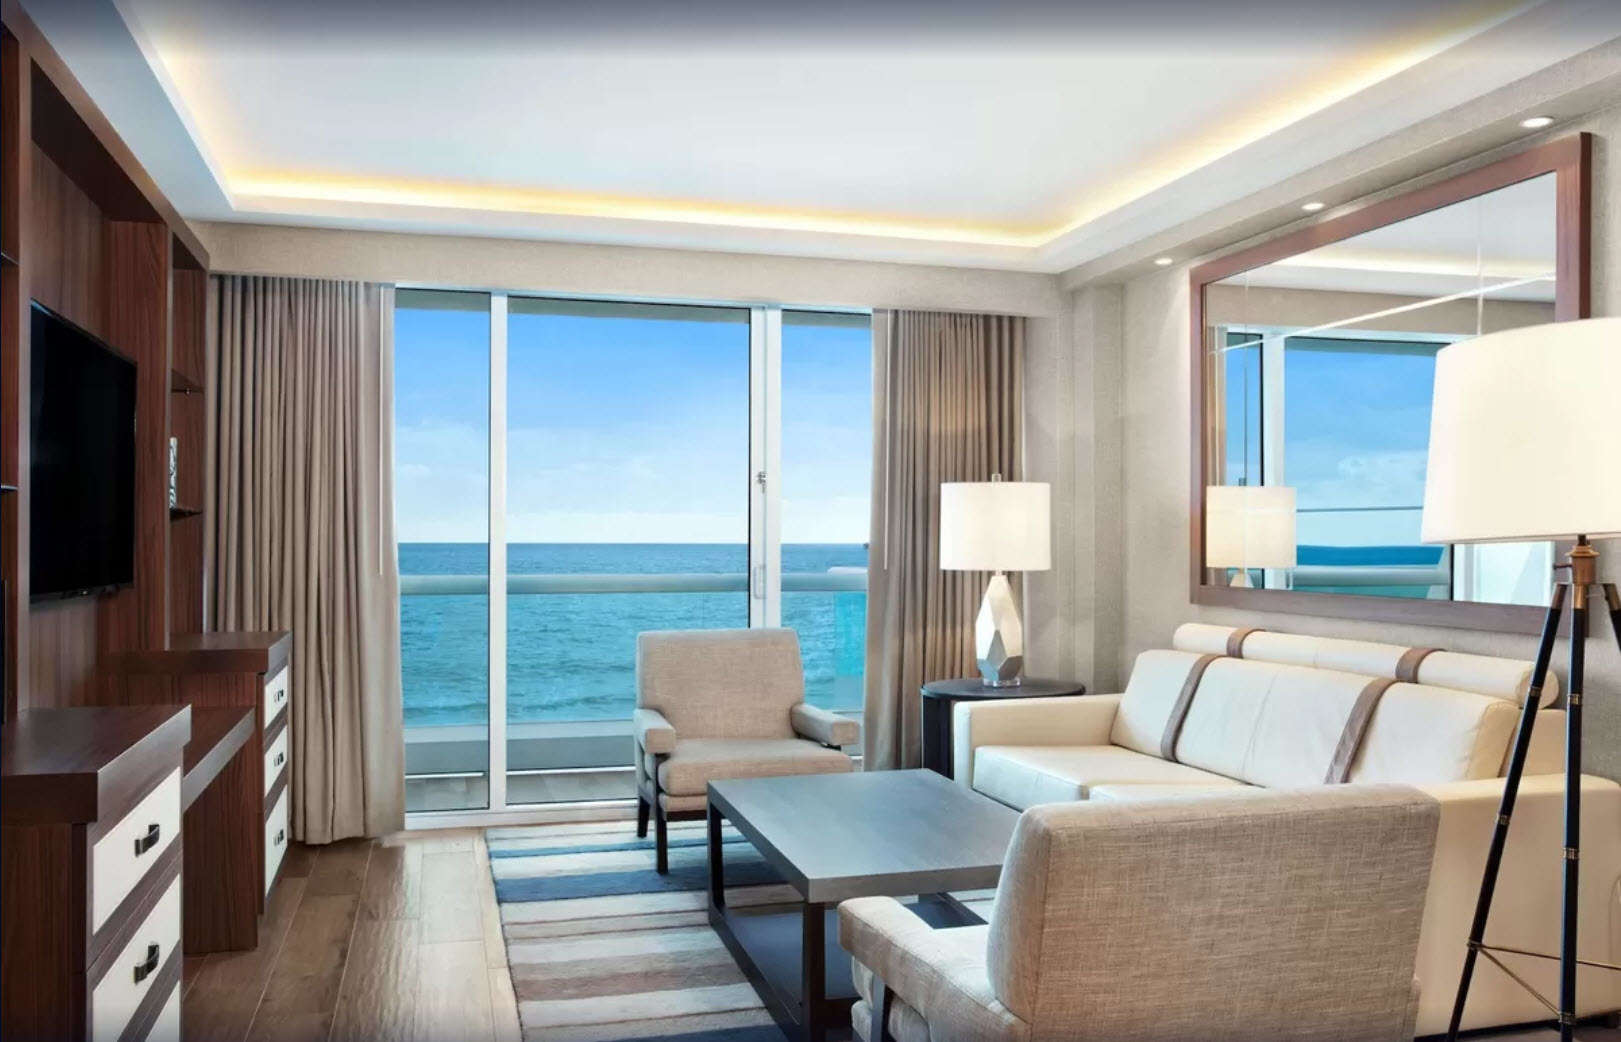 Luxury vacation rentals usa - Florida - Fort lauderdale - Conrad fort lauderdale beach - 1 BDM Oceanfront - Image 1/9